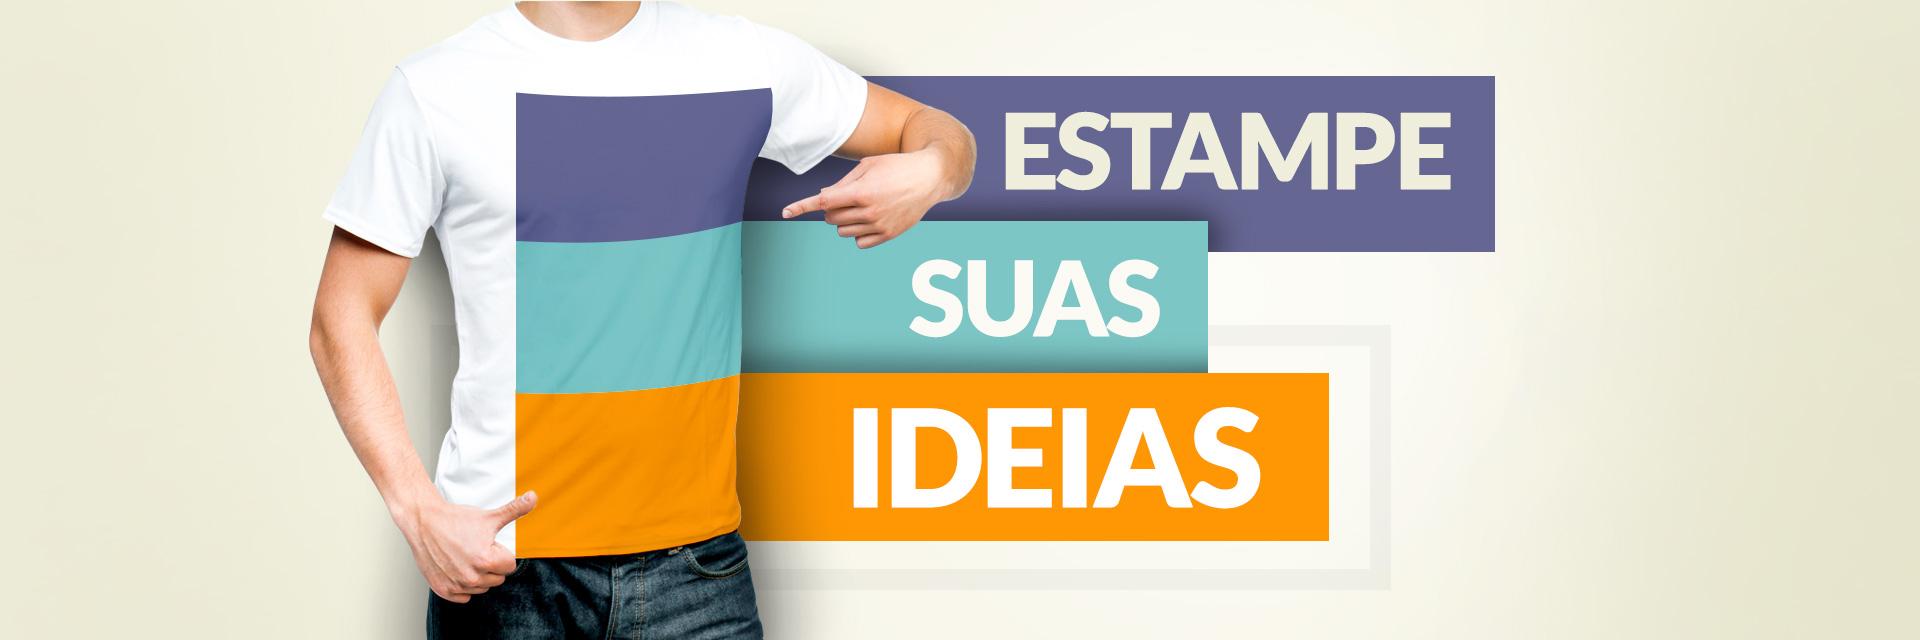 Fábrica de Camisetas | Estampe Suas Ideias